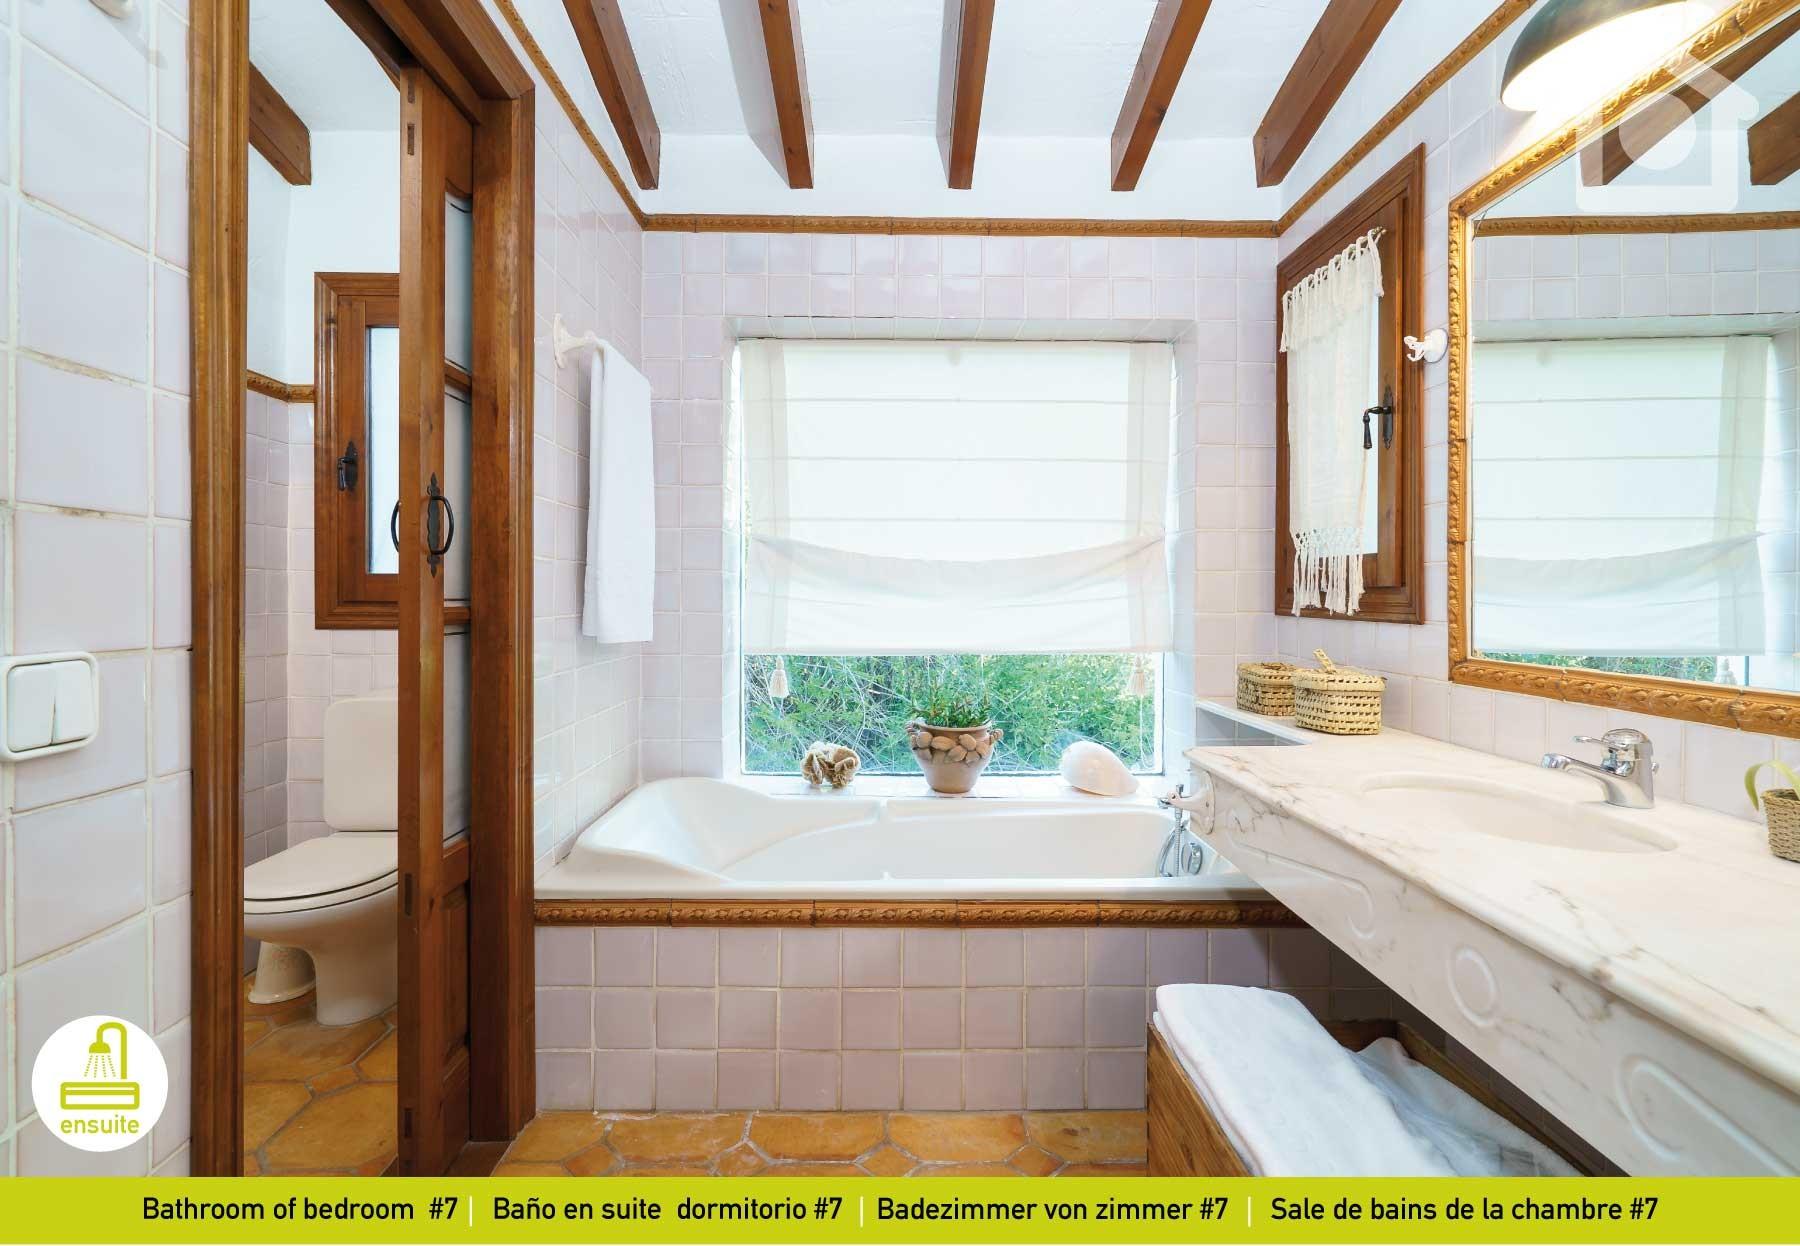 villas in moraira - solhabitat portet sand, Badezimmer ideen